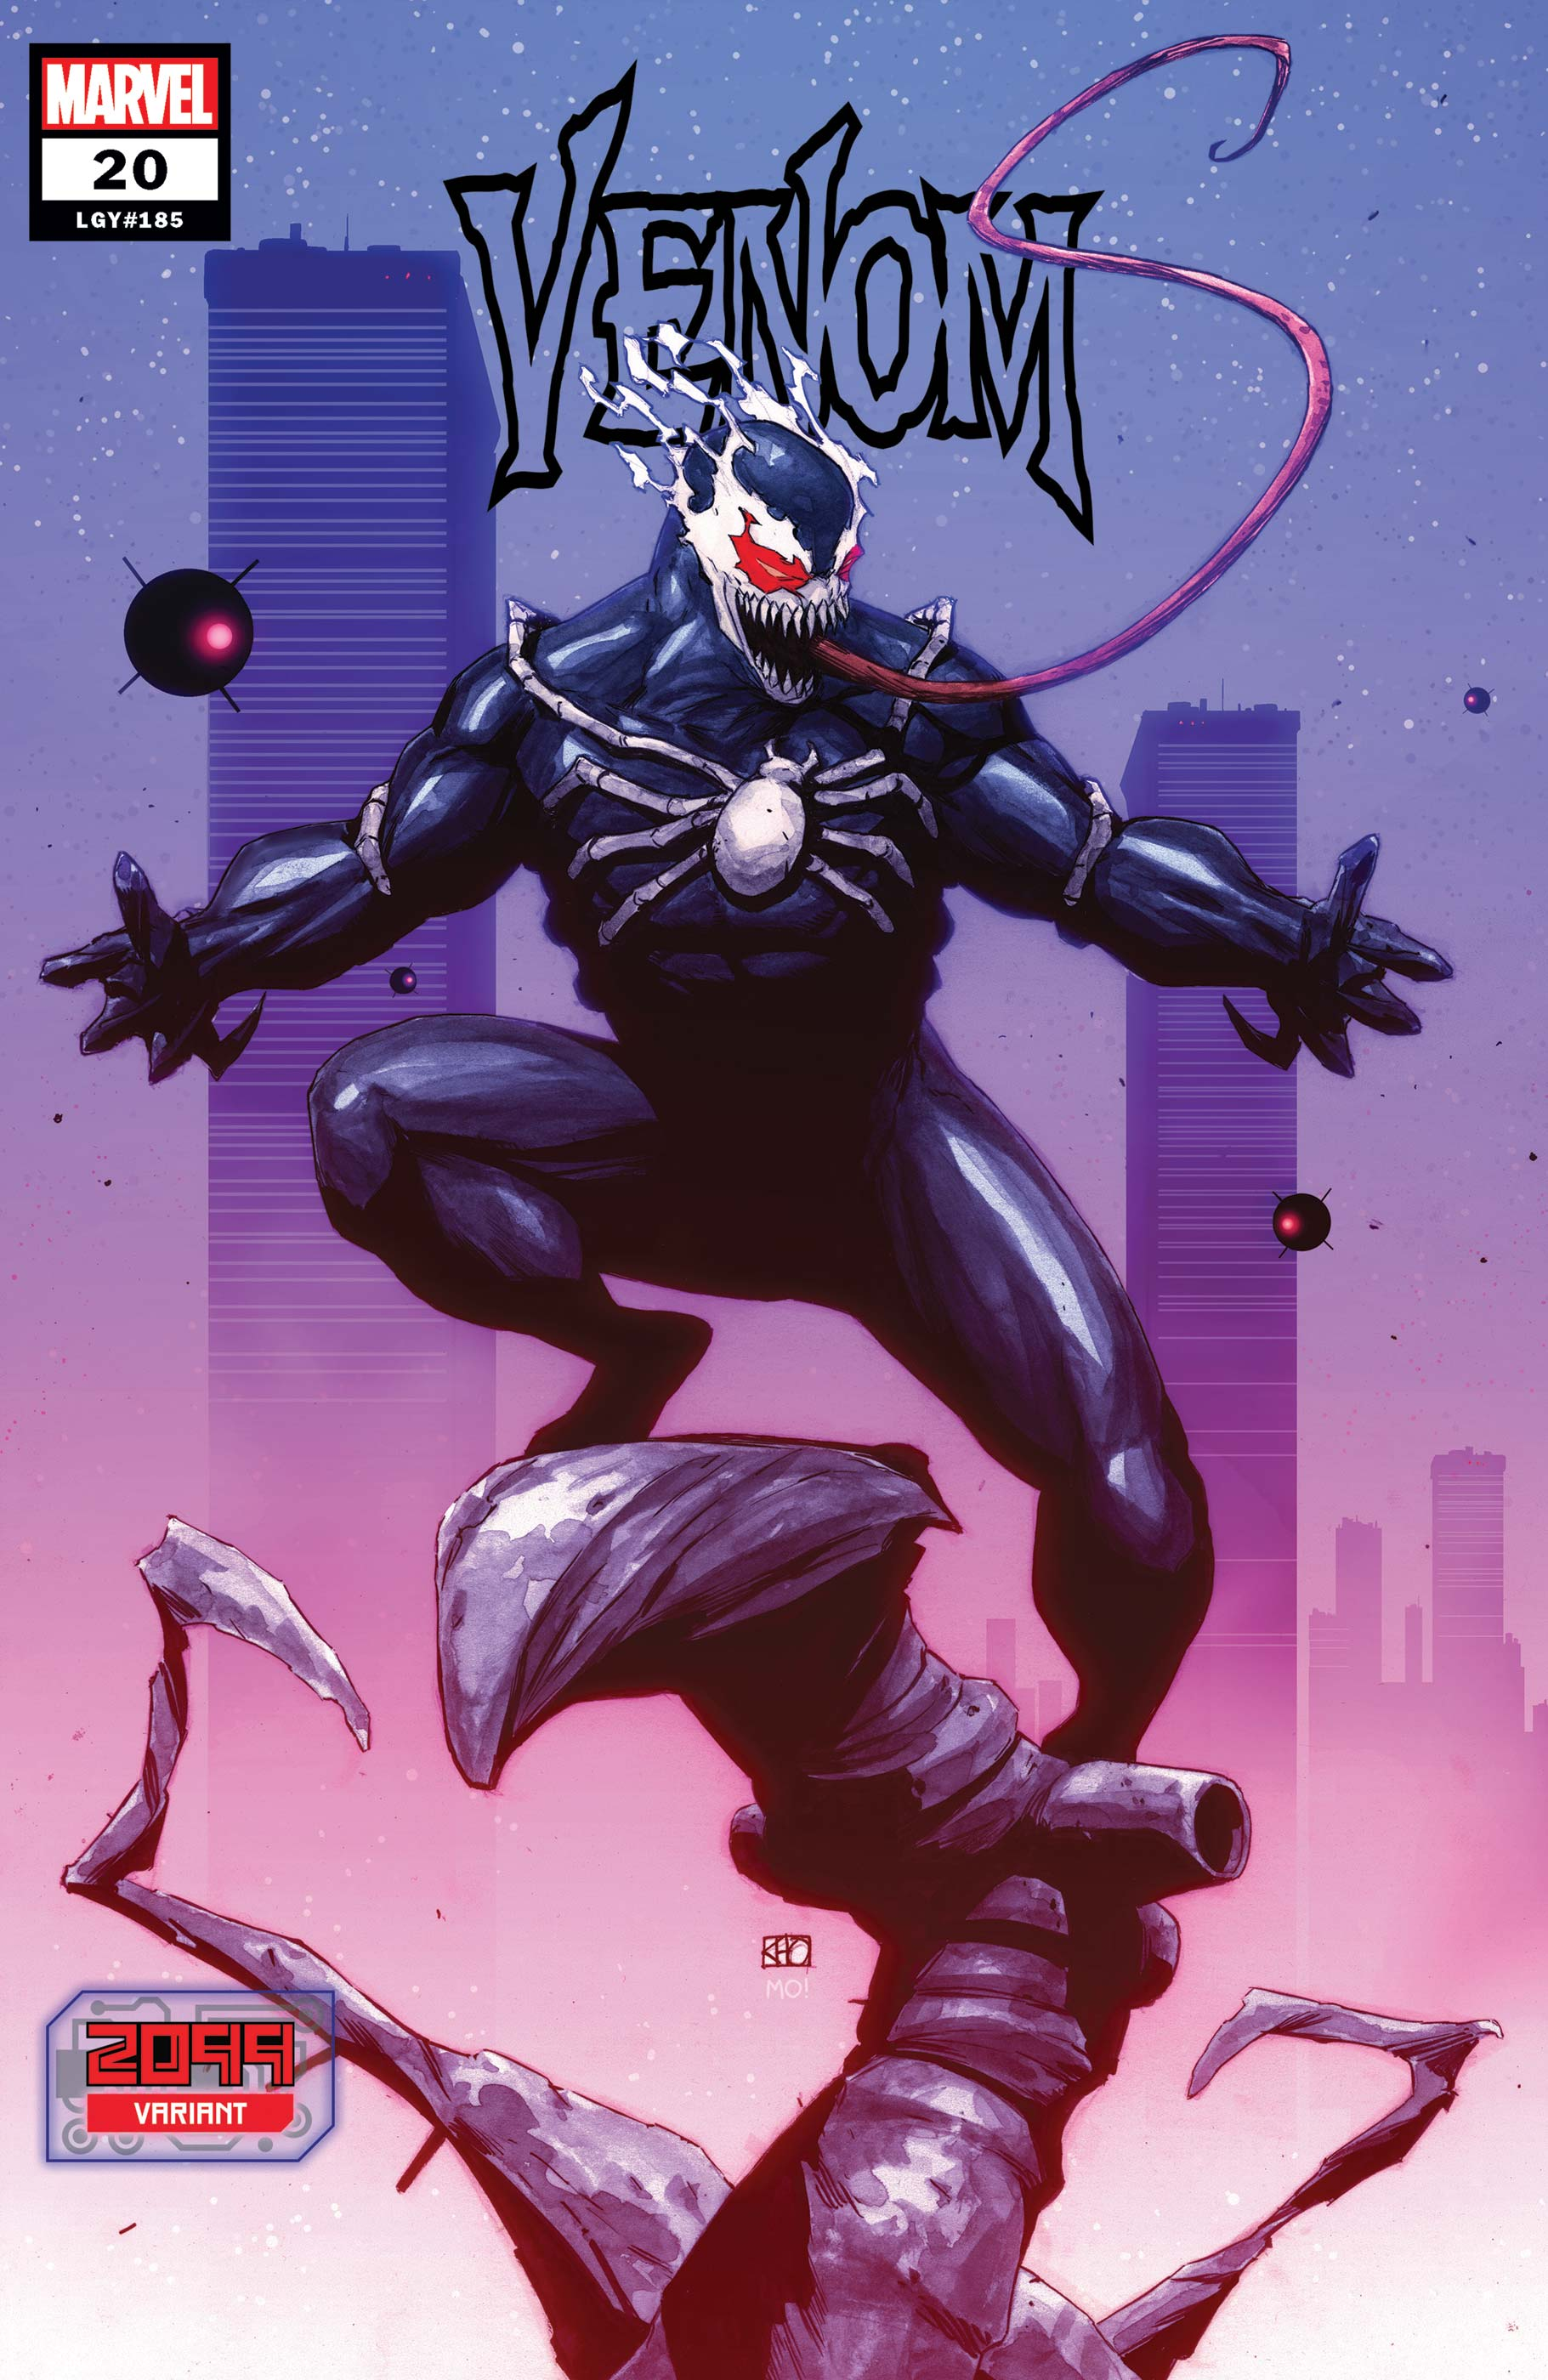 Venom (2018) #20 (Variant)